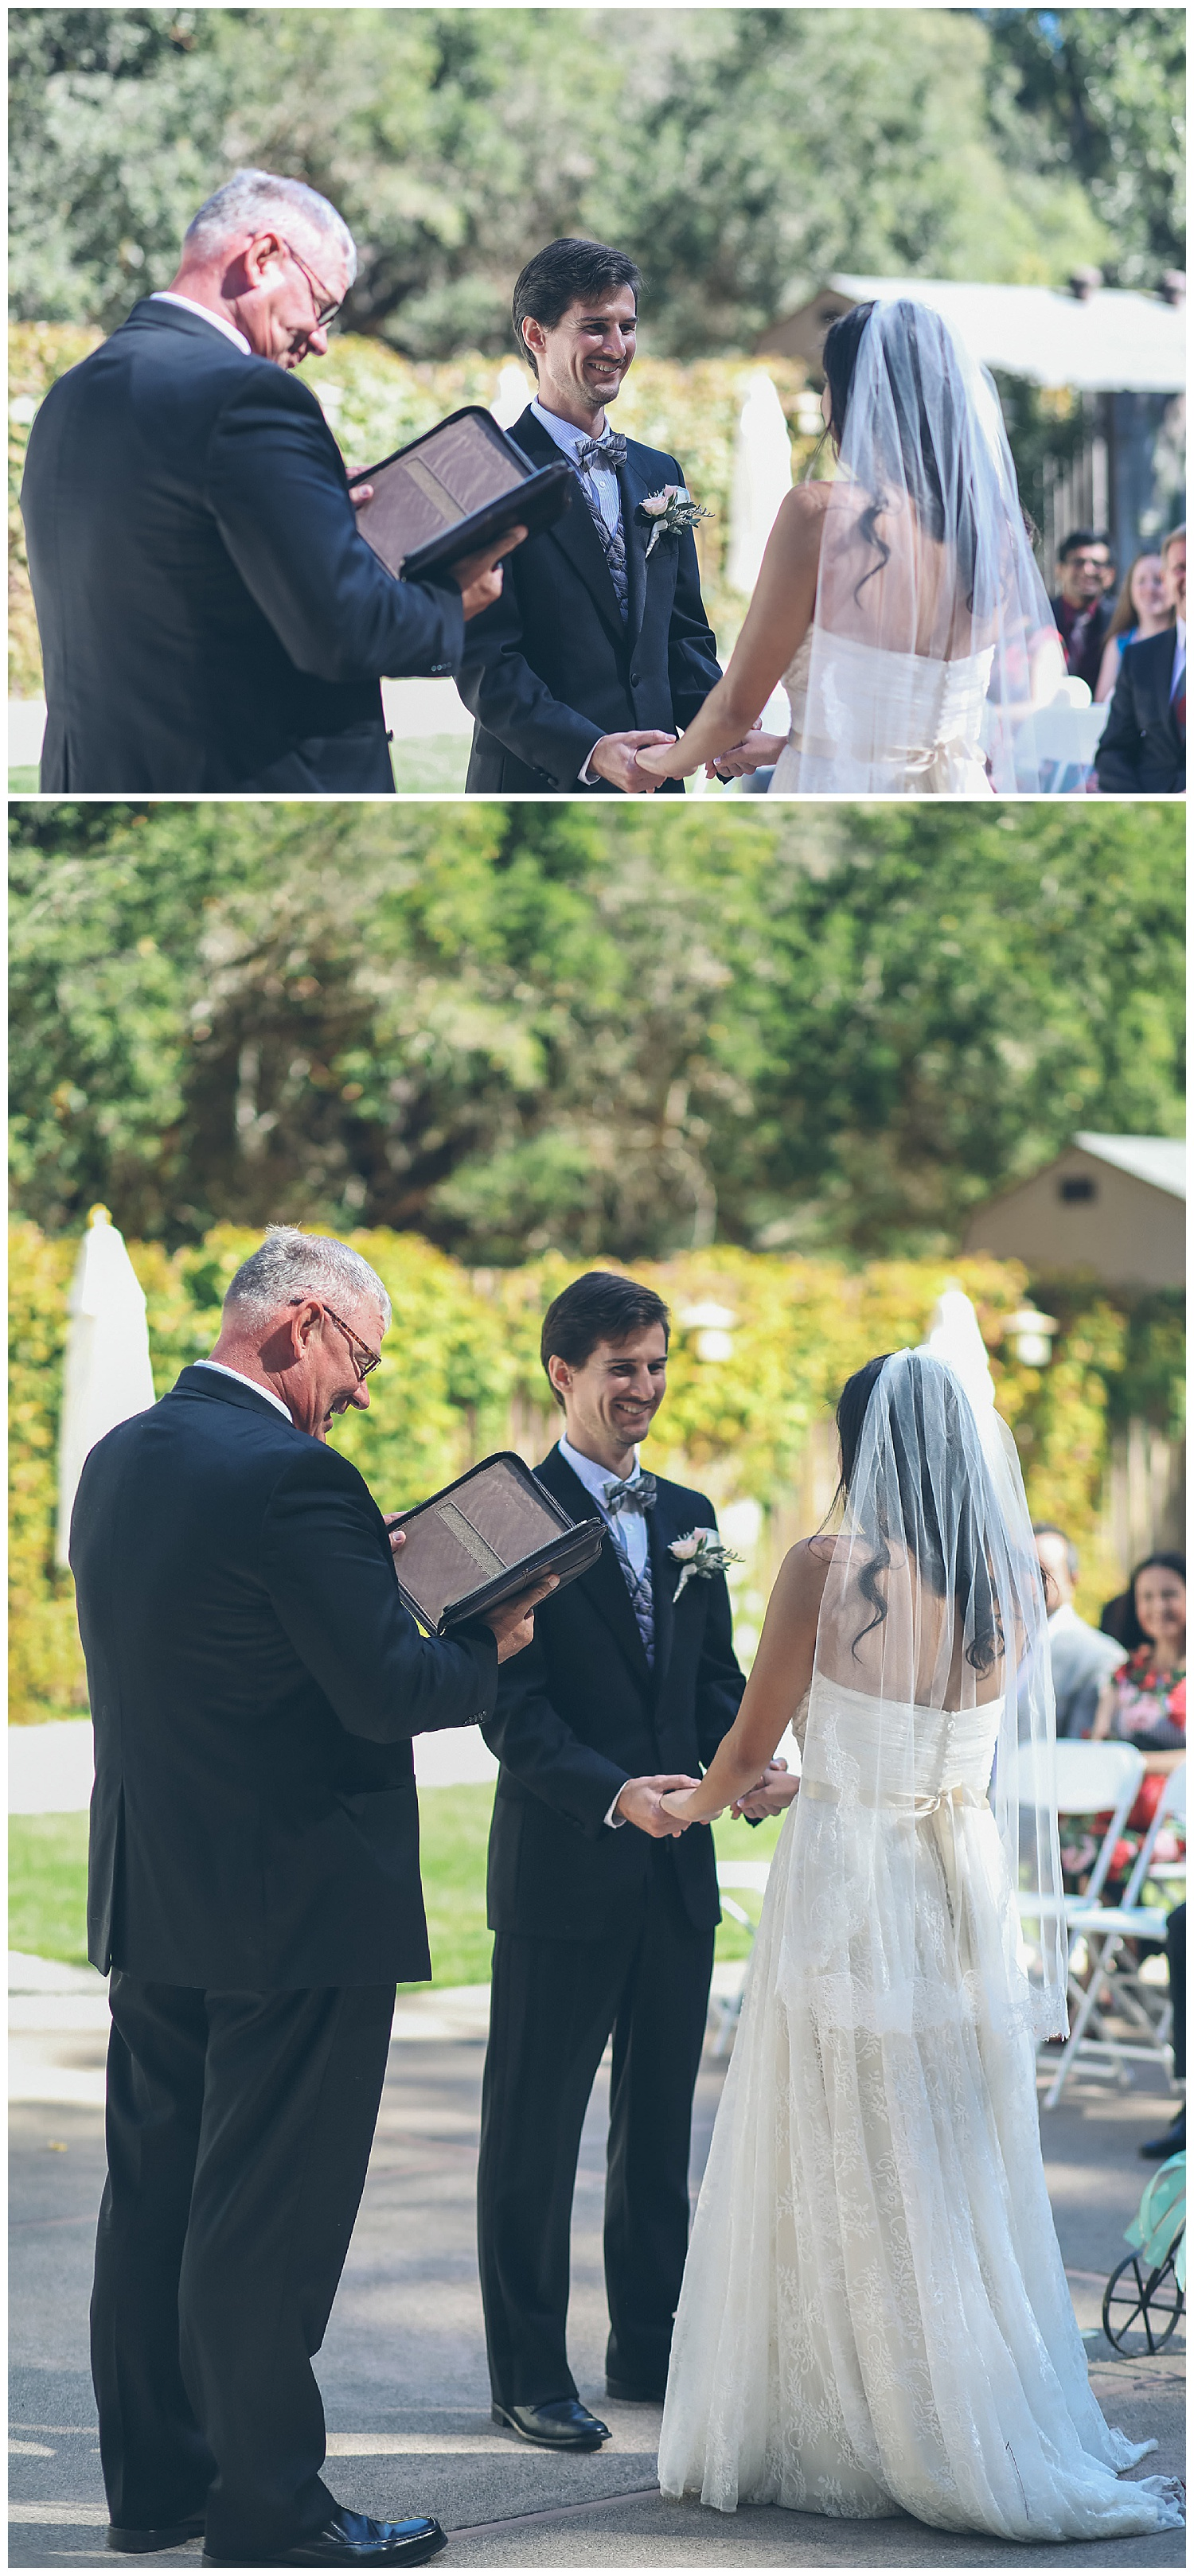 khariza-rae-photography-bay-area-wedding-photographer_0137.jpg